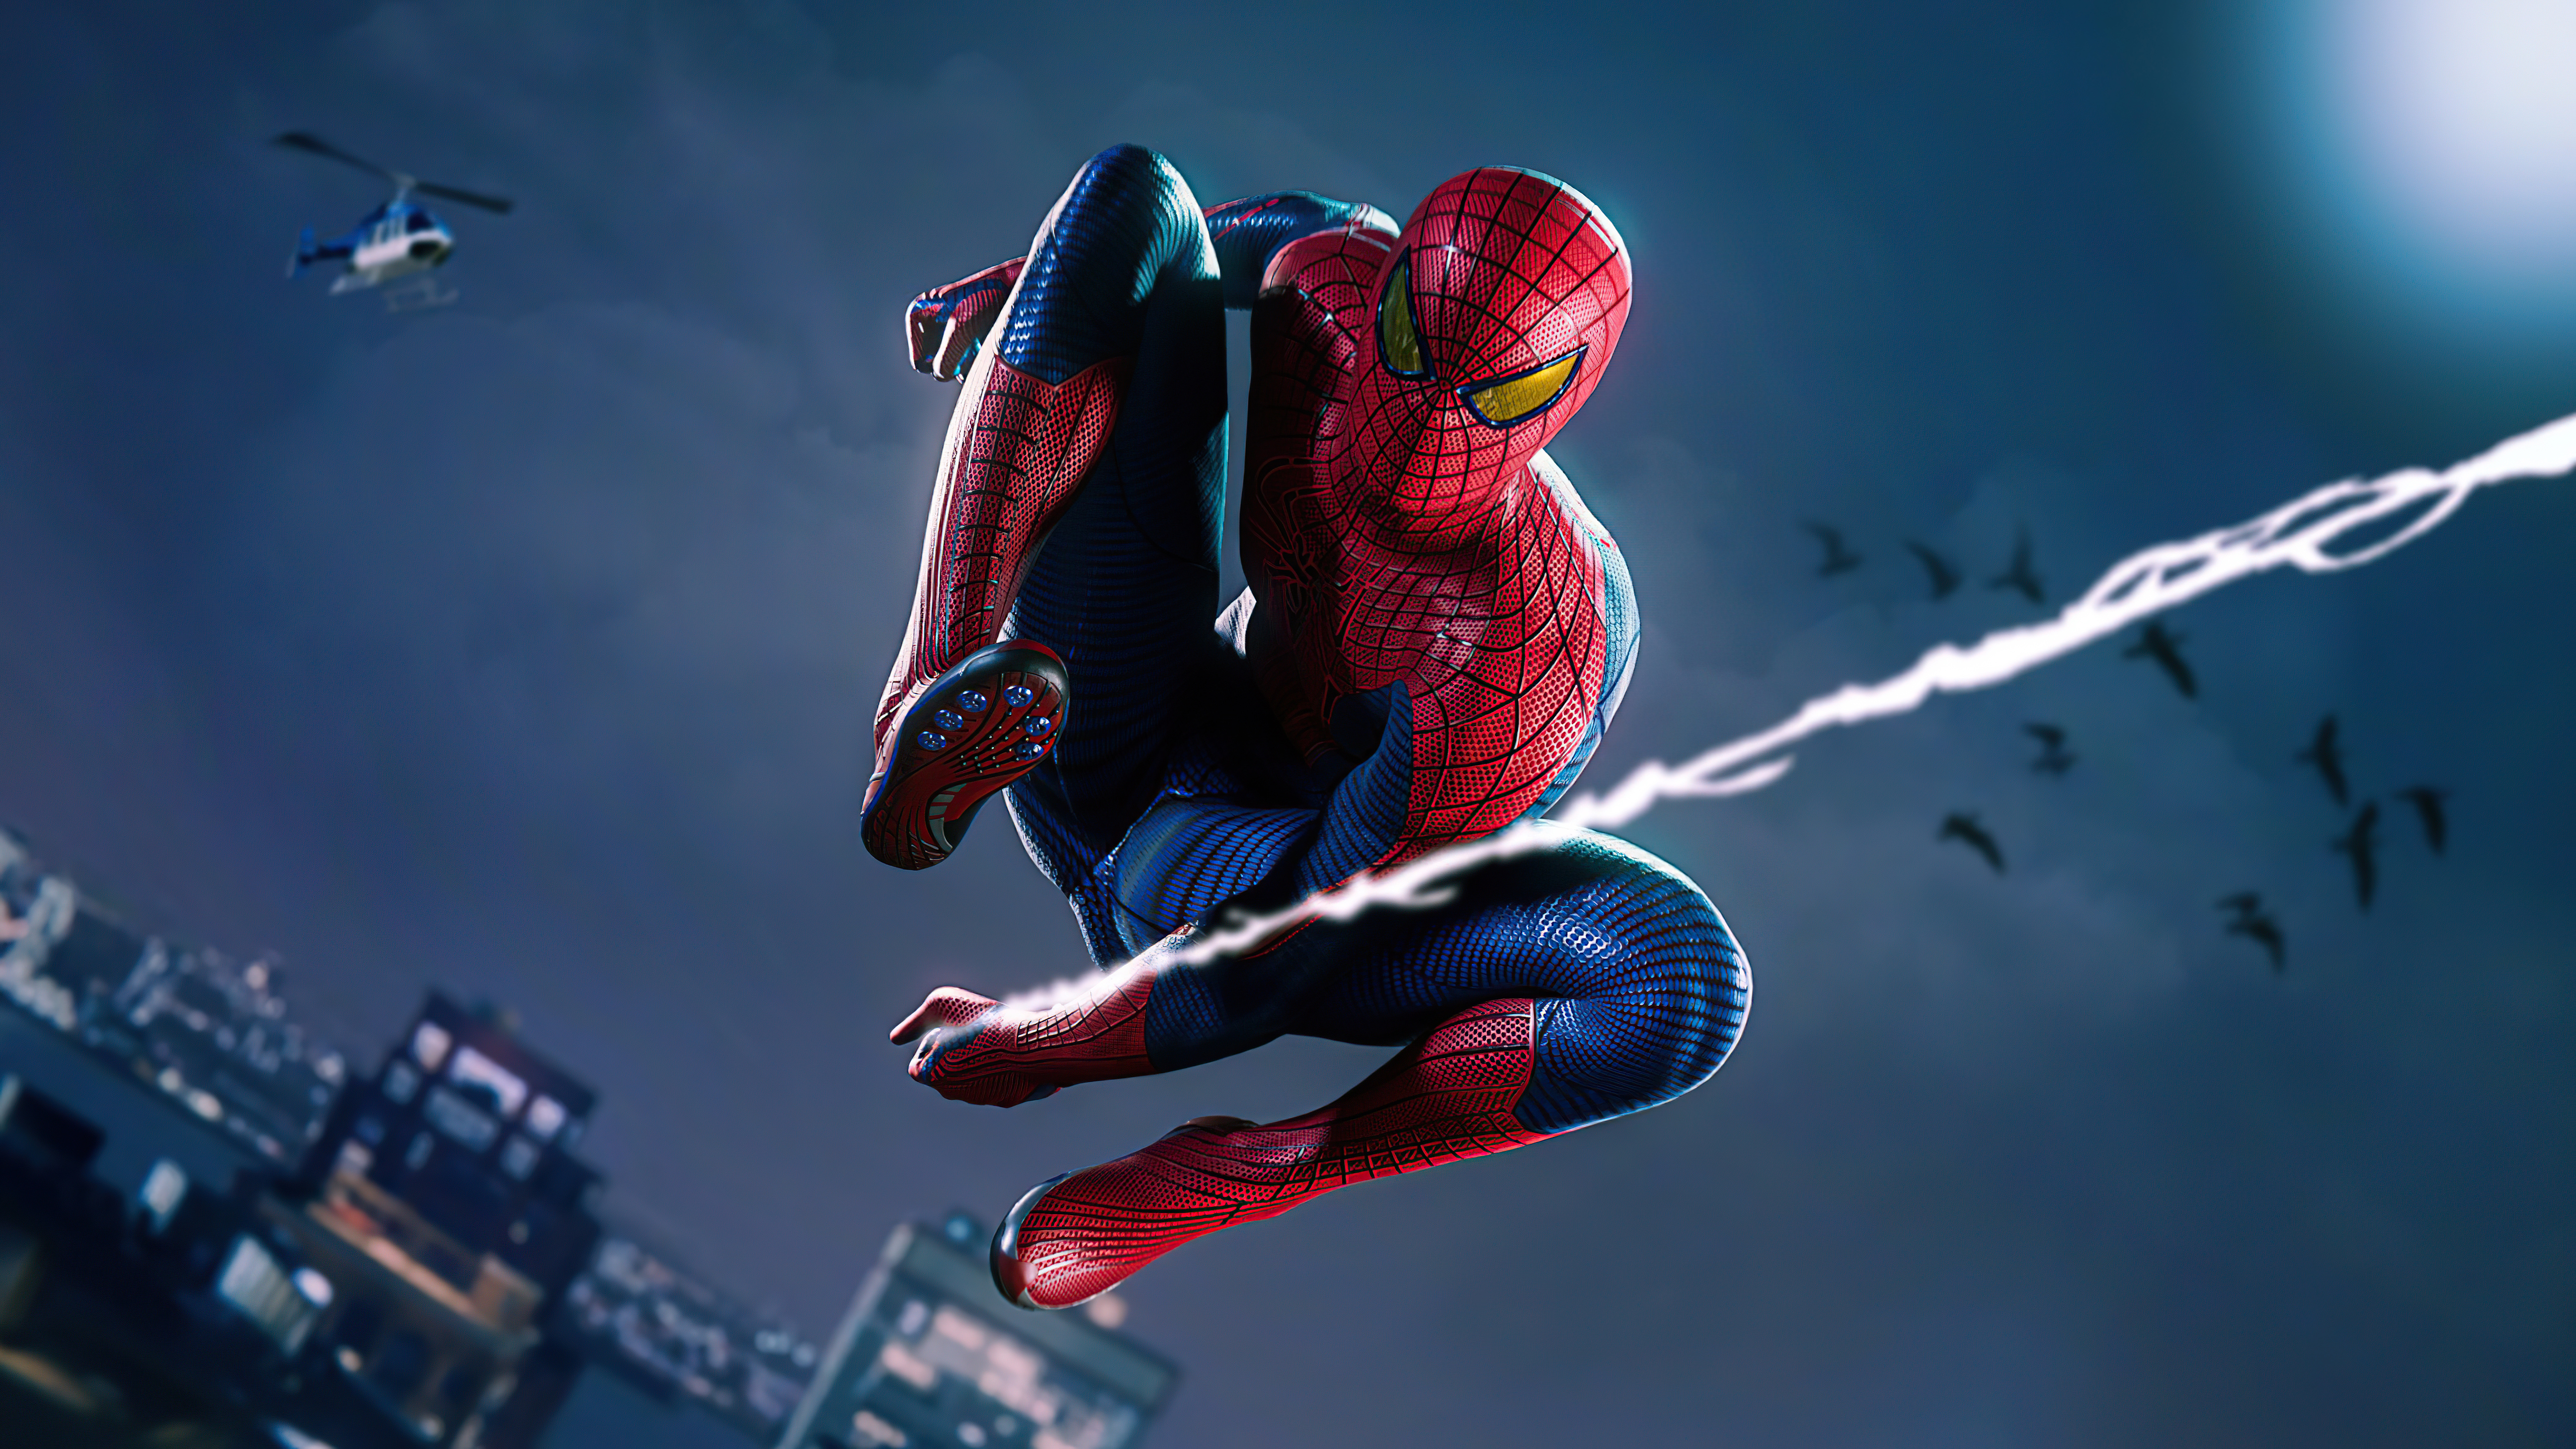 Wallpaper Spiderman Remastered PS5